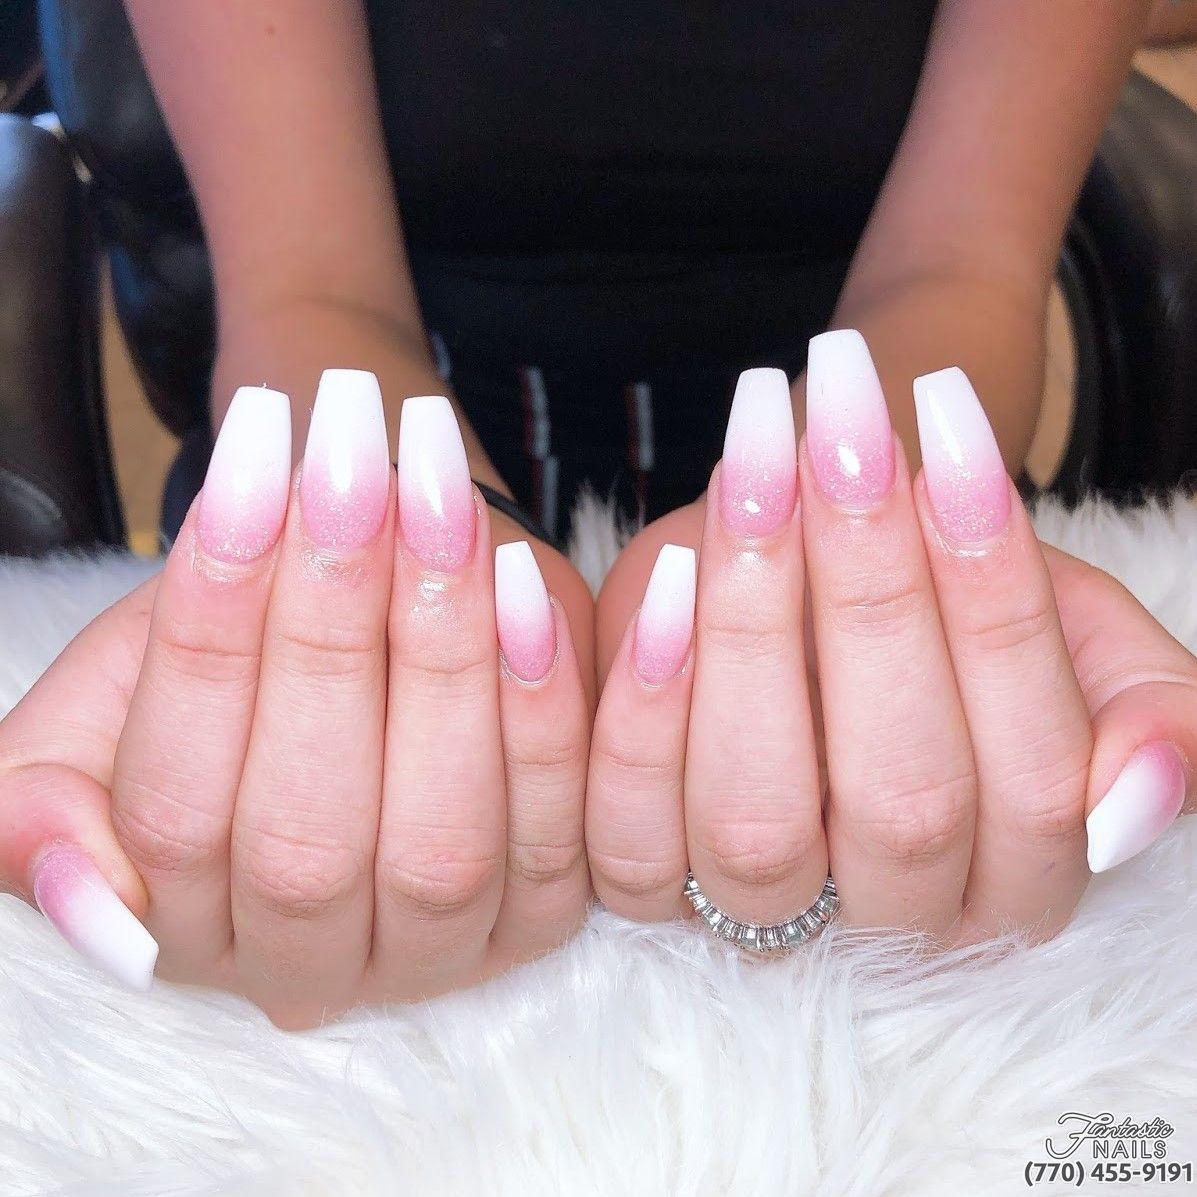 Fantastic Nails | Nail salon 30092 | Peachtree Corners GA